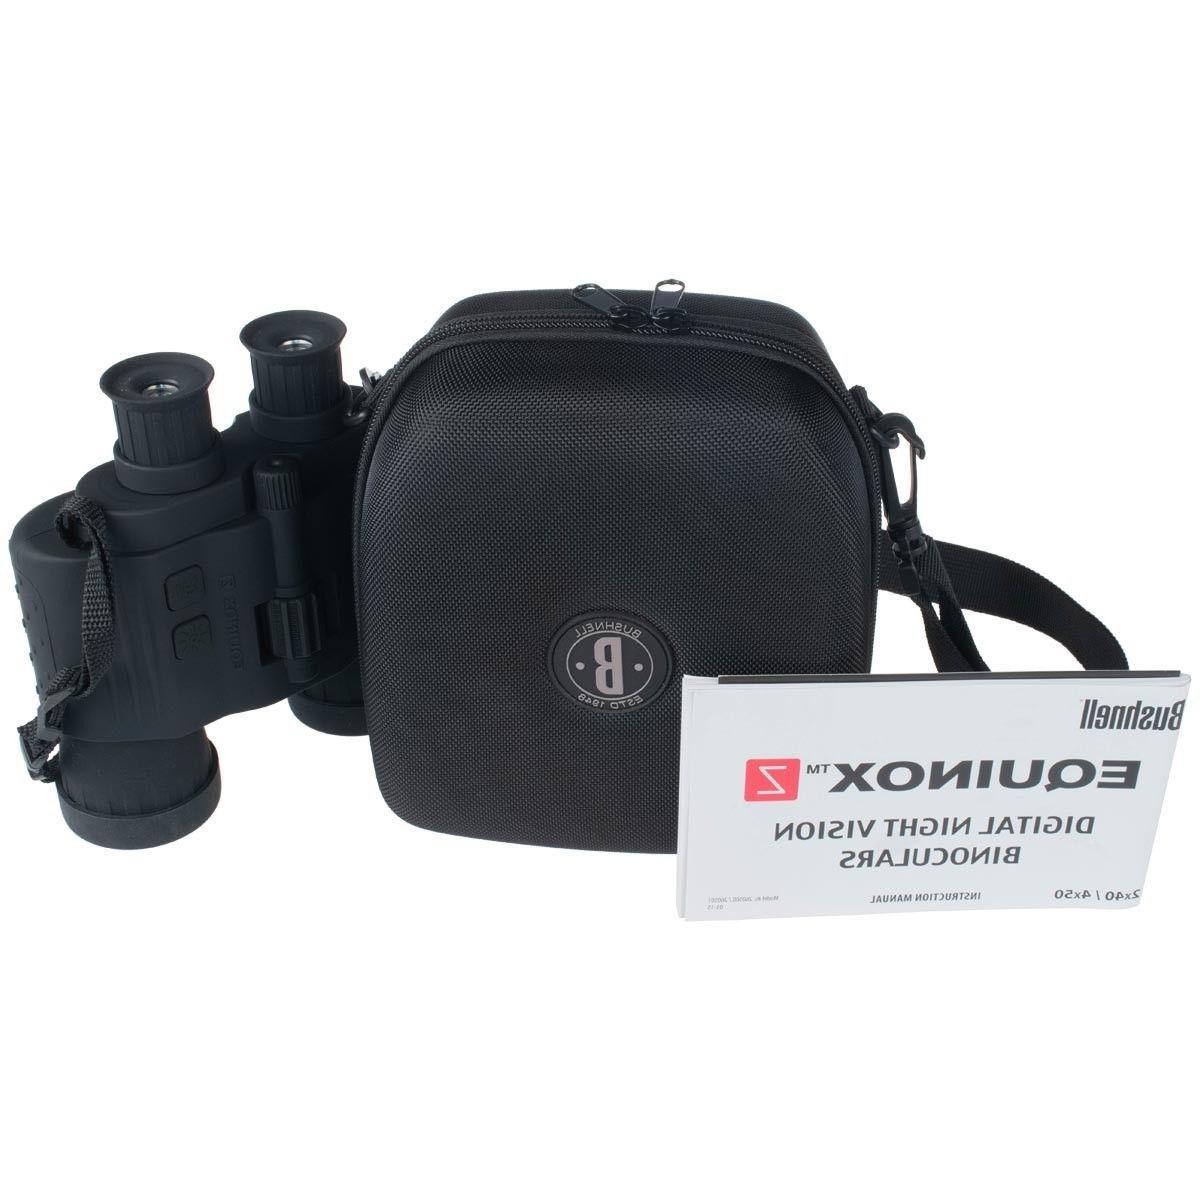 260500 night vision 2x 40mm equinox z